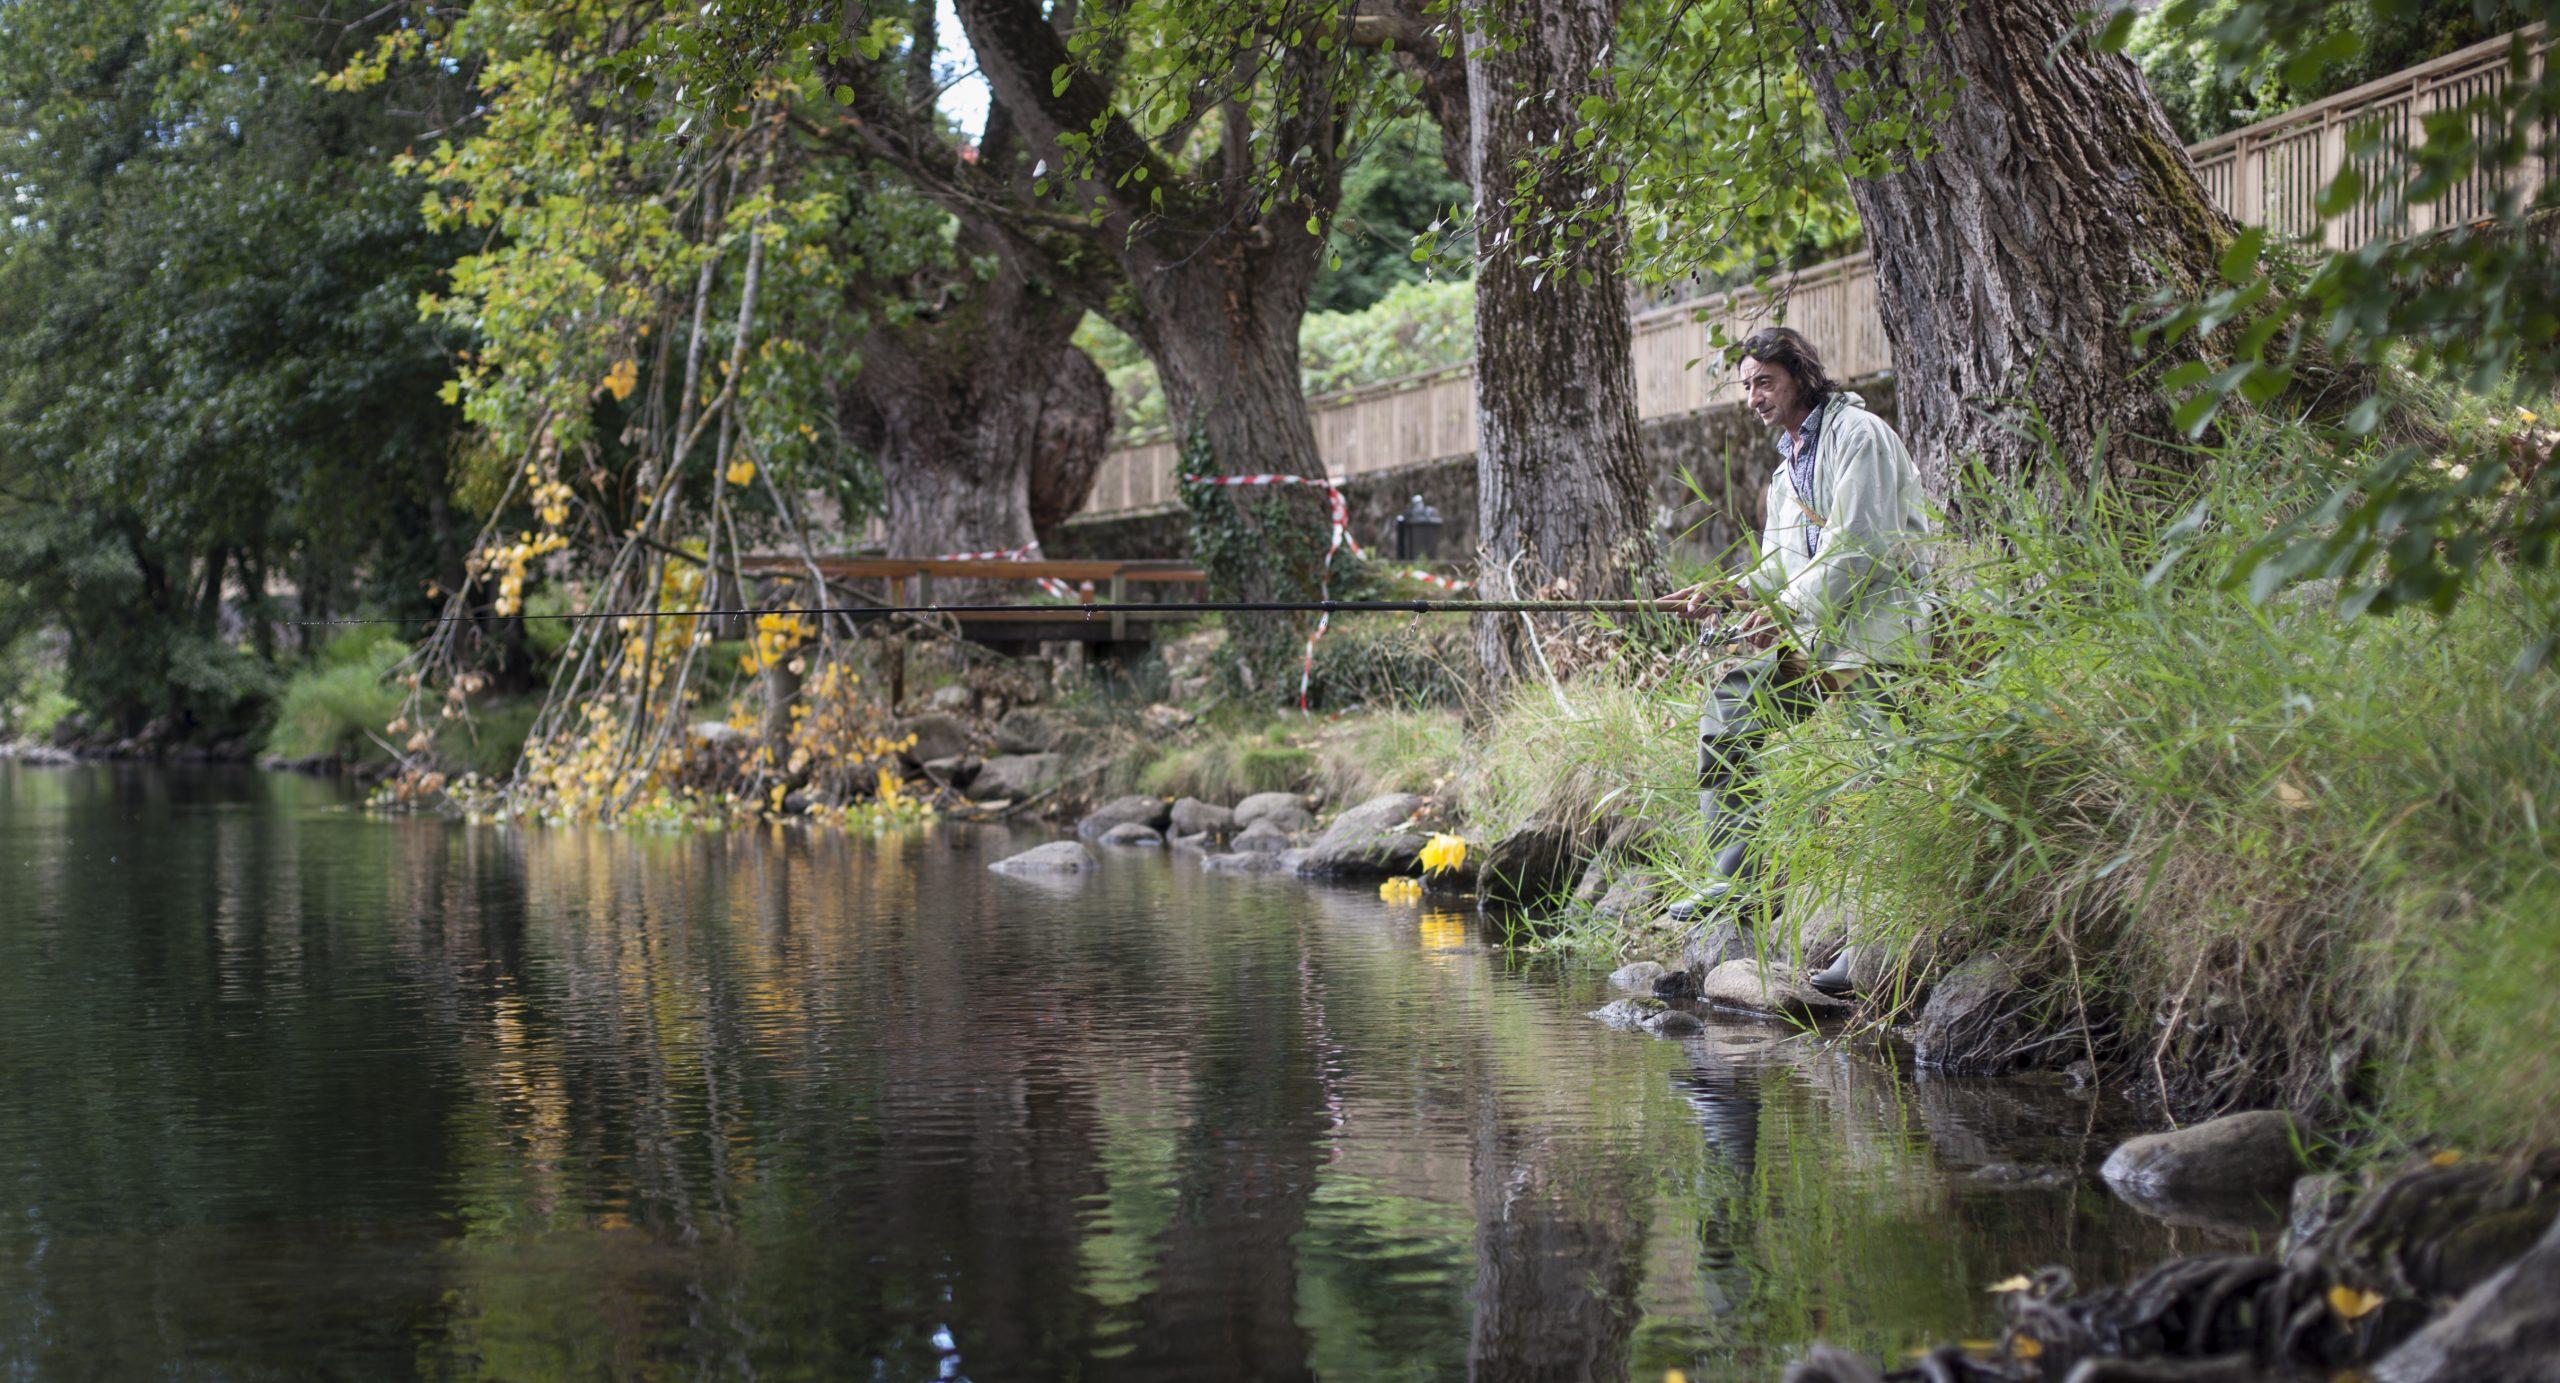 Berardo Sandoval pêche dans l'Ariège, à Foix